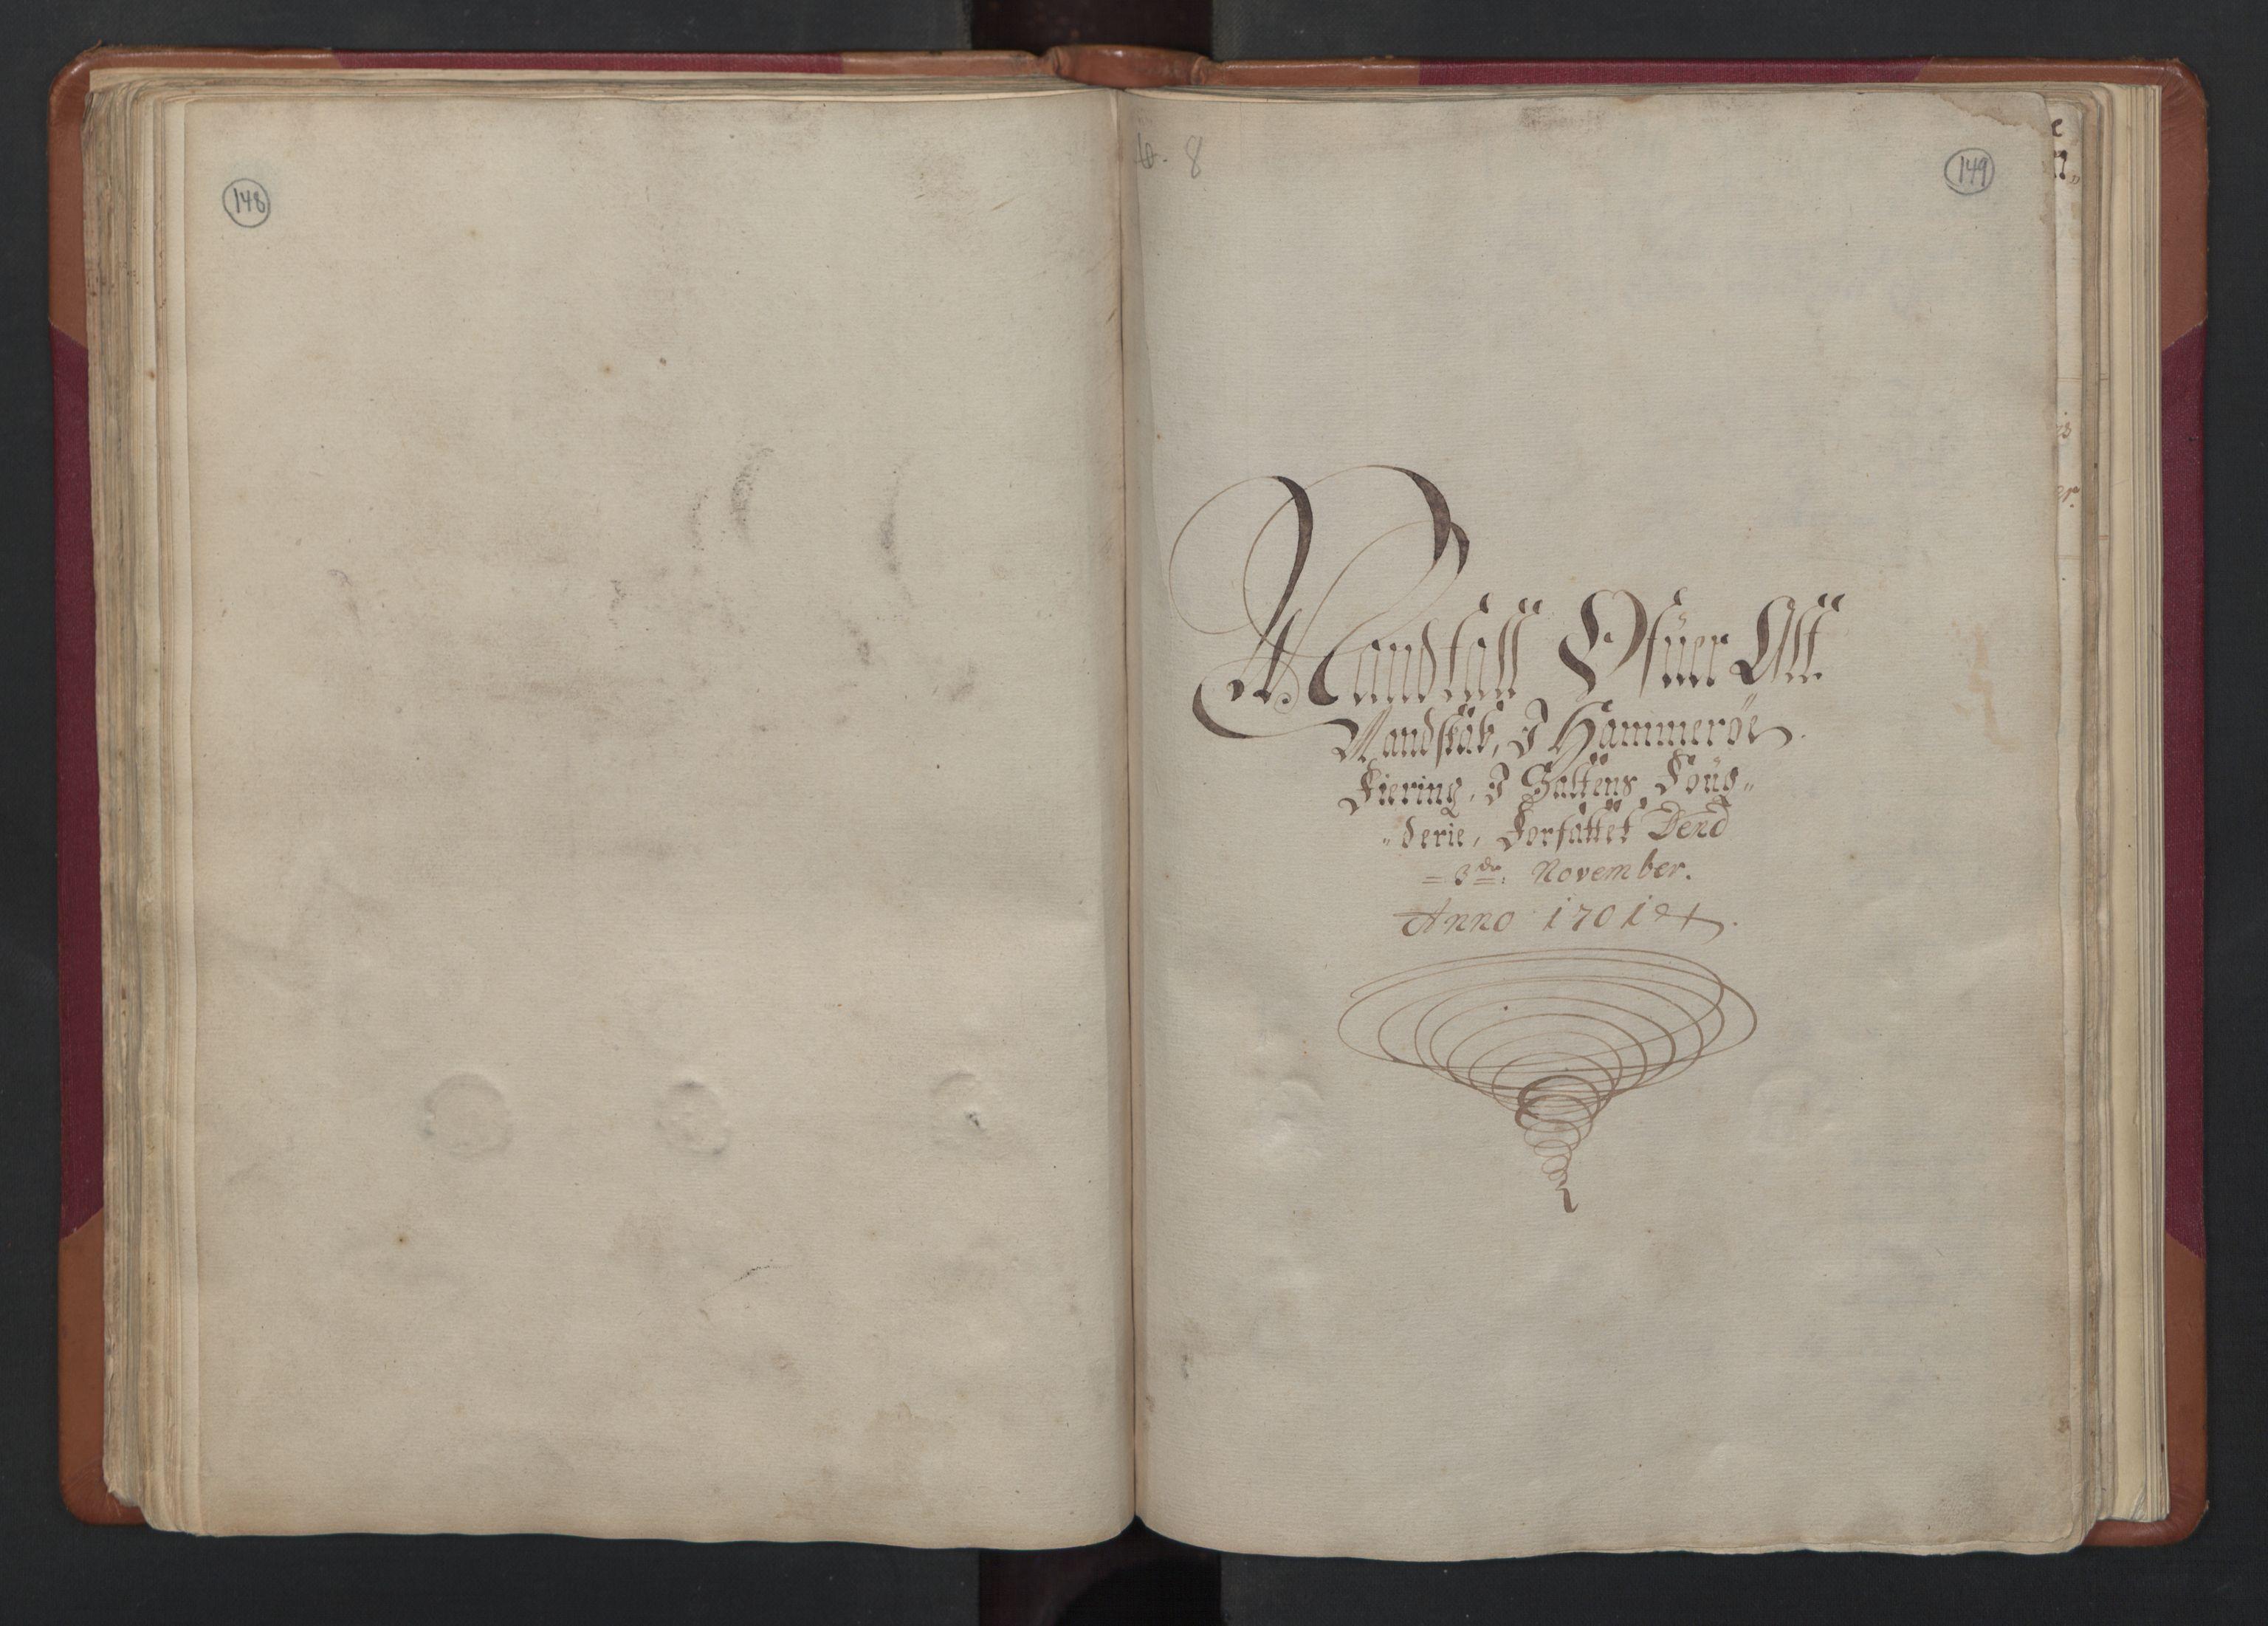 RA, Manntallet 1701, nr. 17: Salten fogderi, 1701, s. 148-149